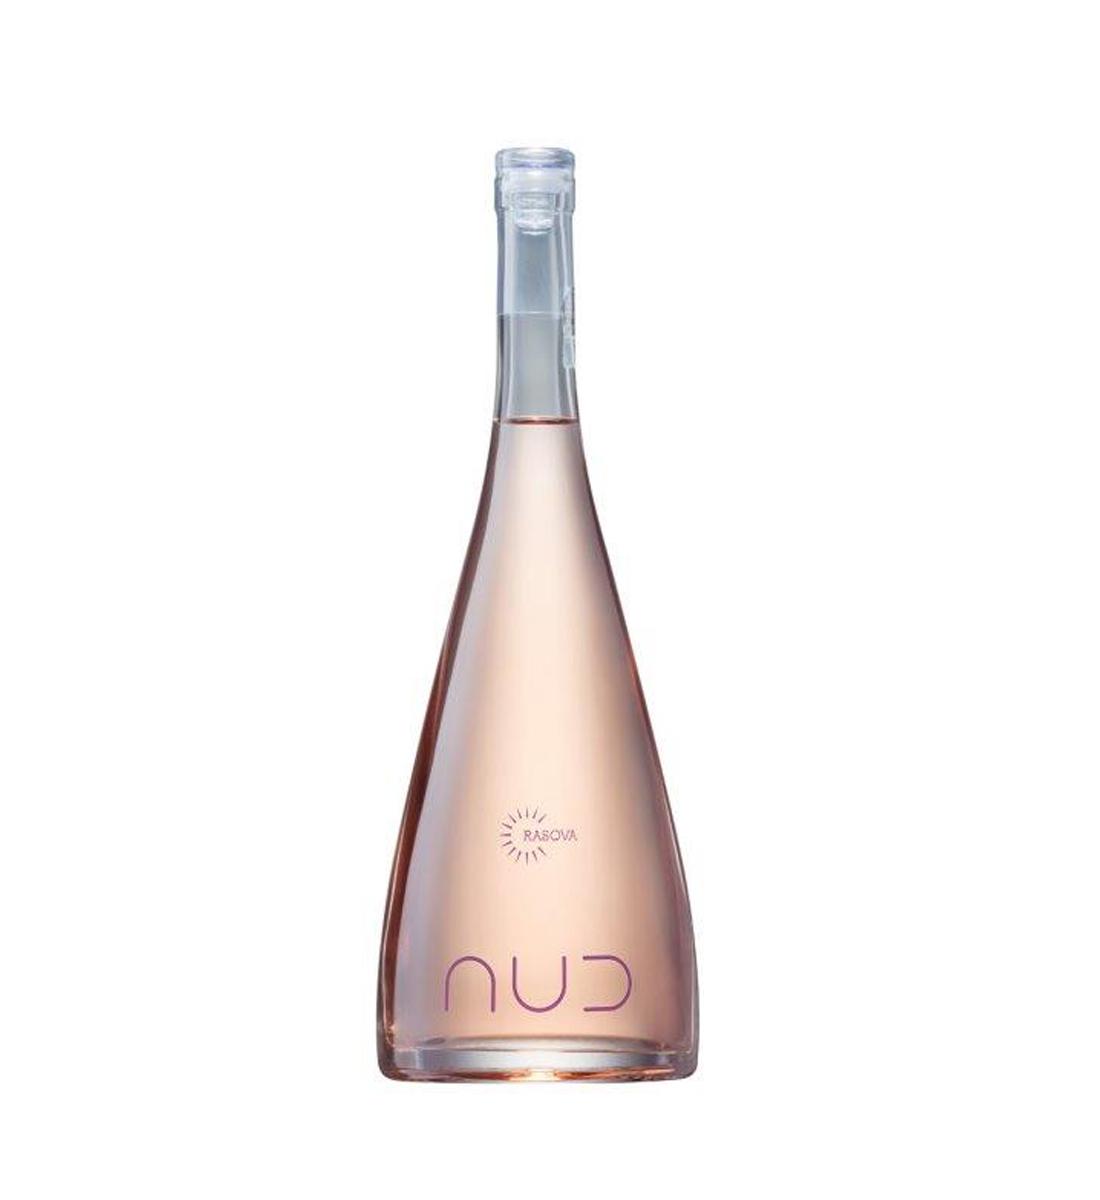 Rasova Nud Rose 0.75L